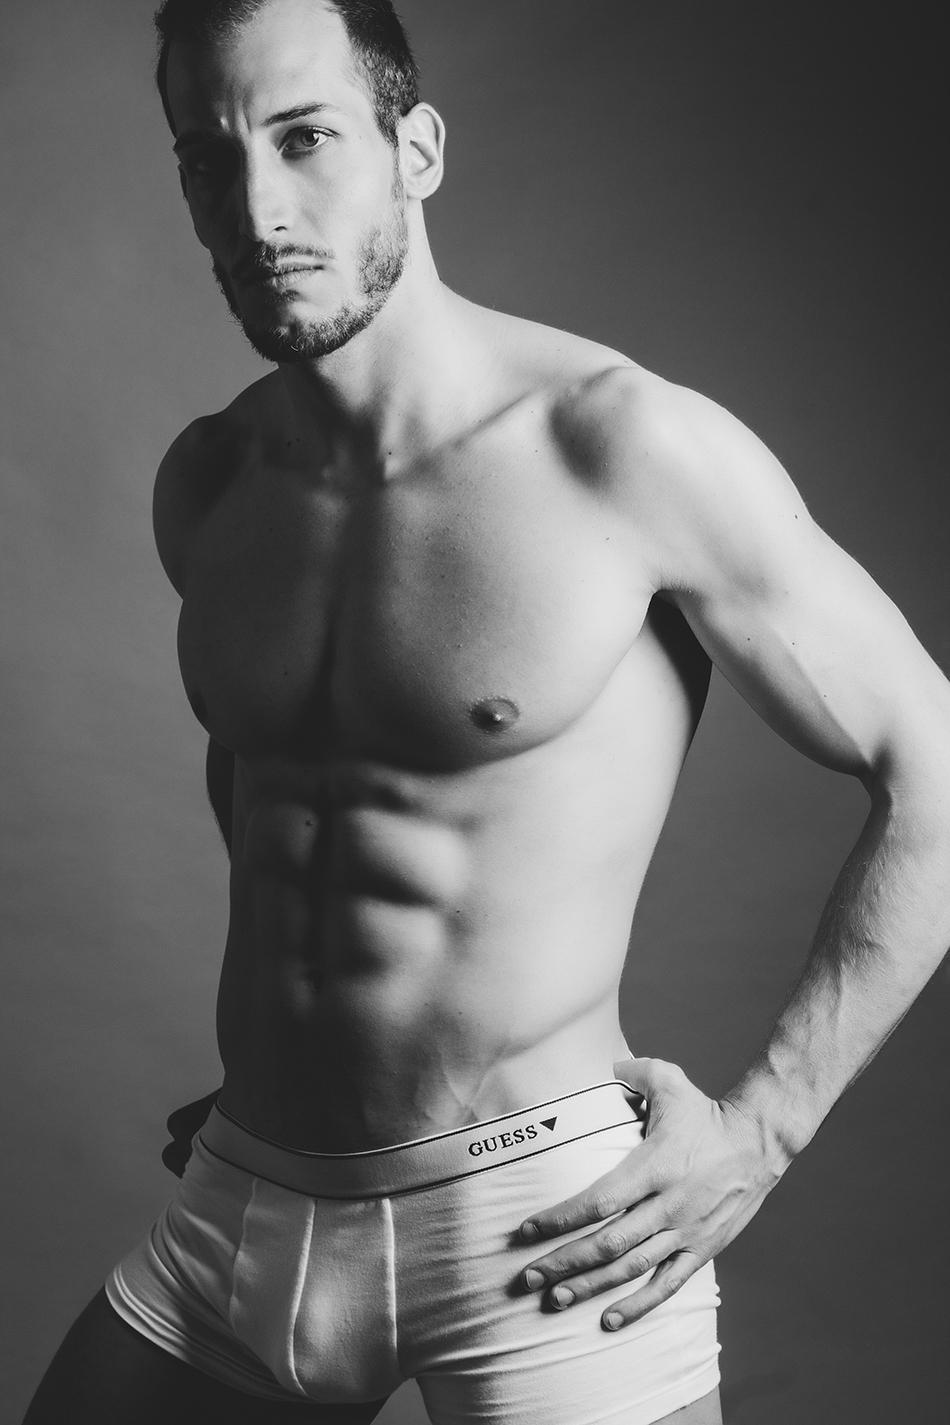 Adon Exclusive: Model David Miguens By David Velez